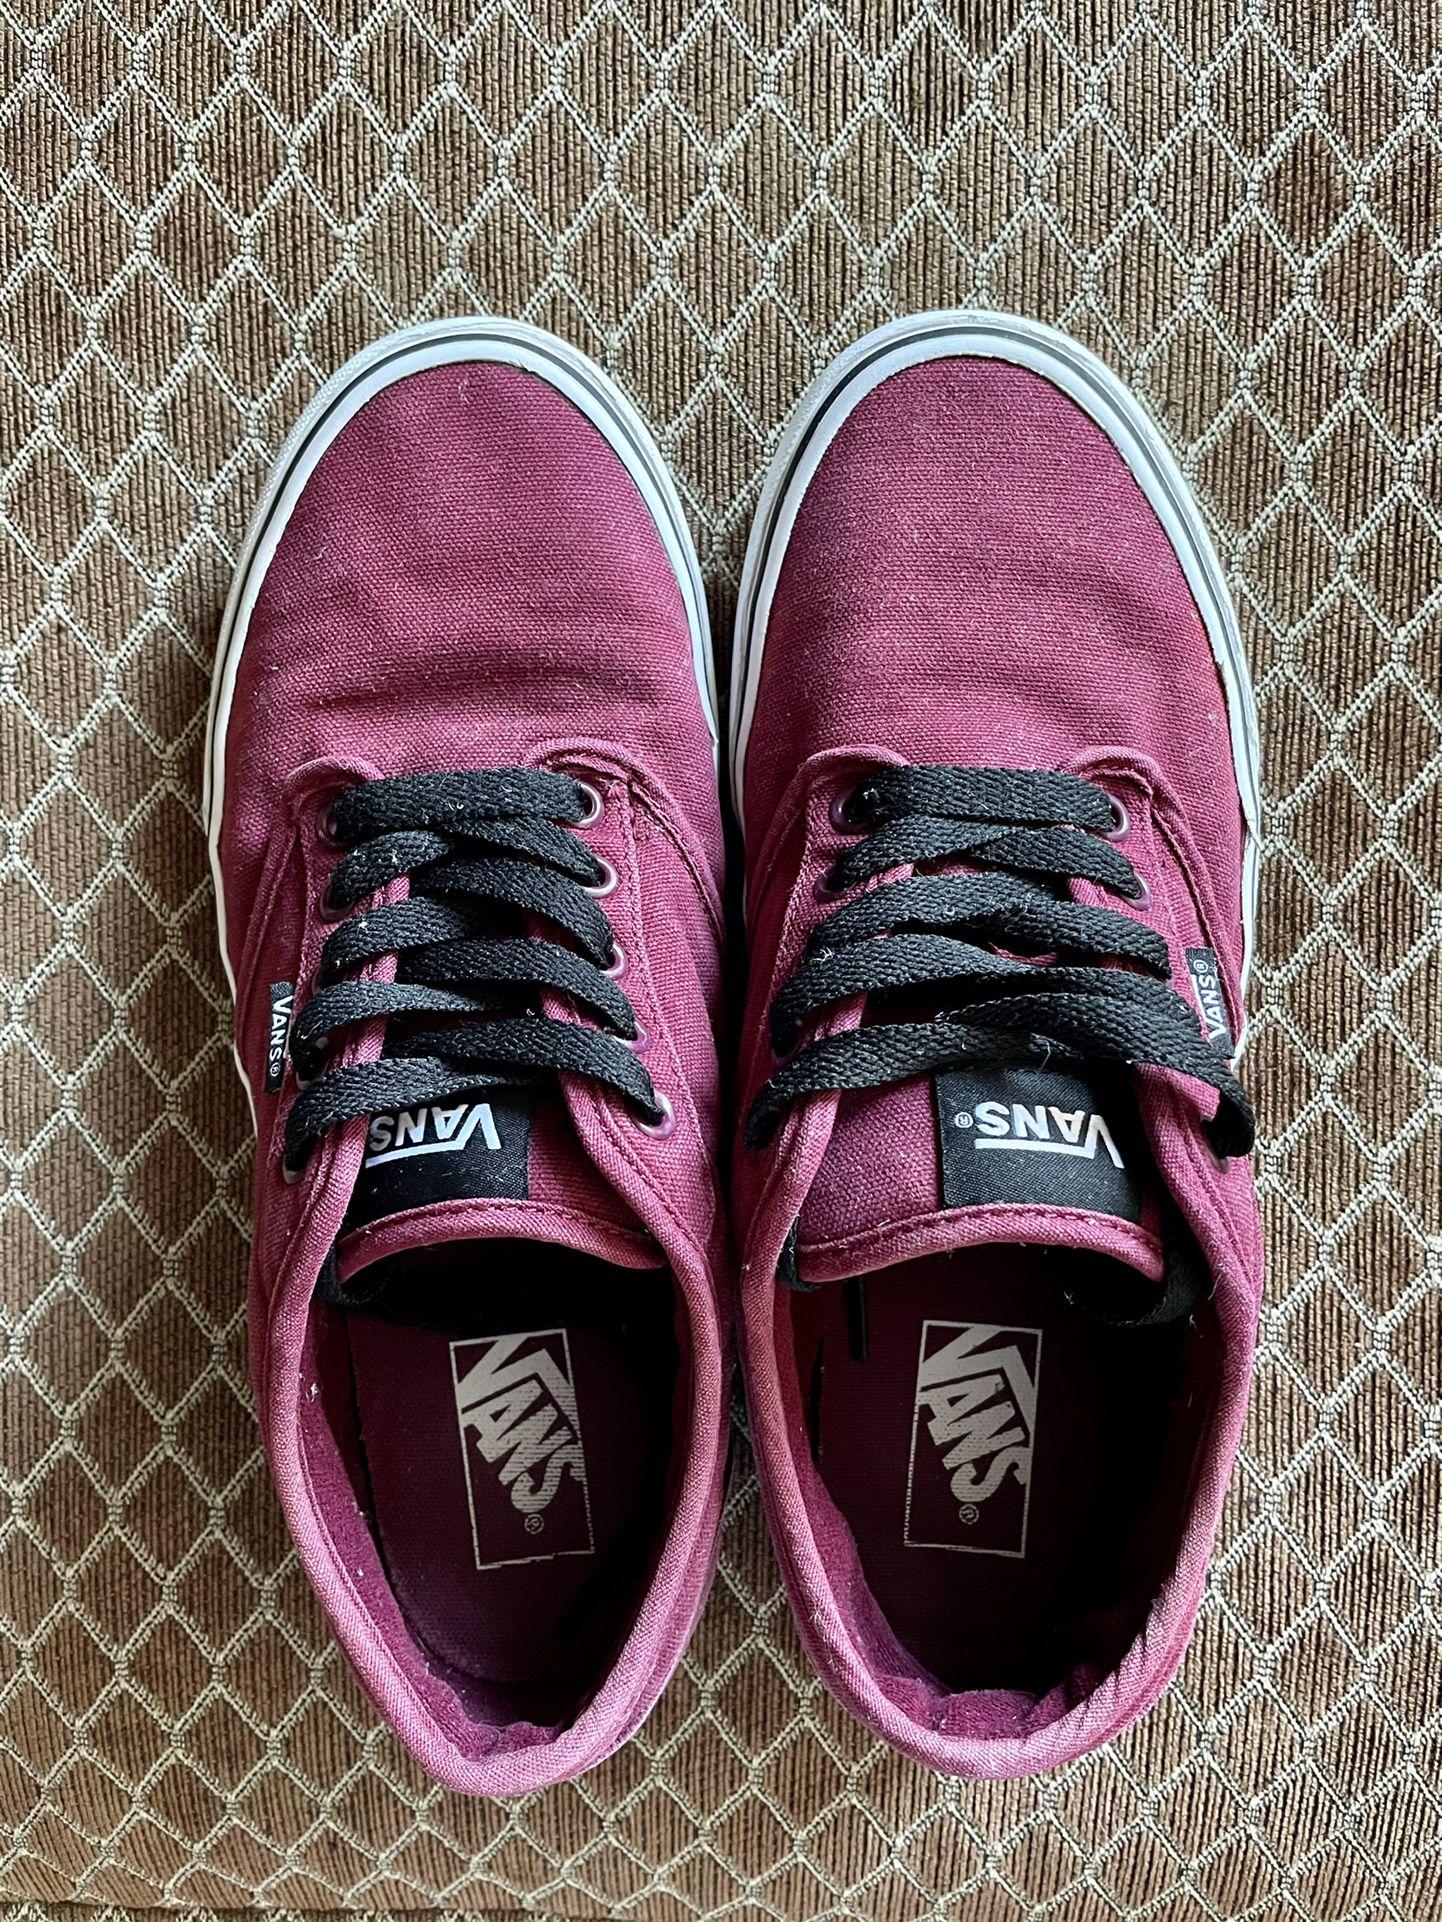 Vans Men Size 10 Burgundy/Red